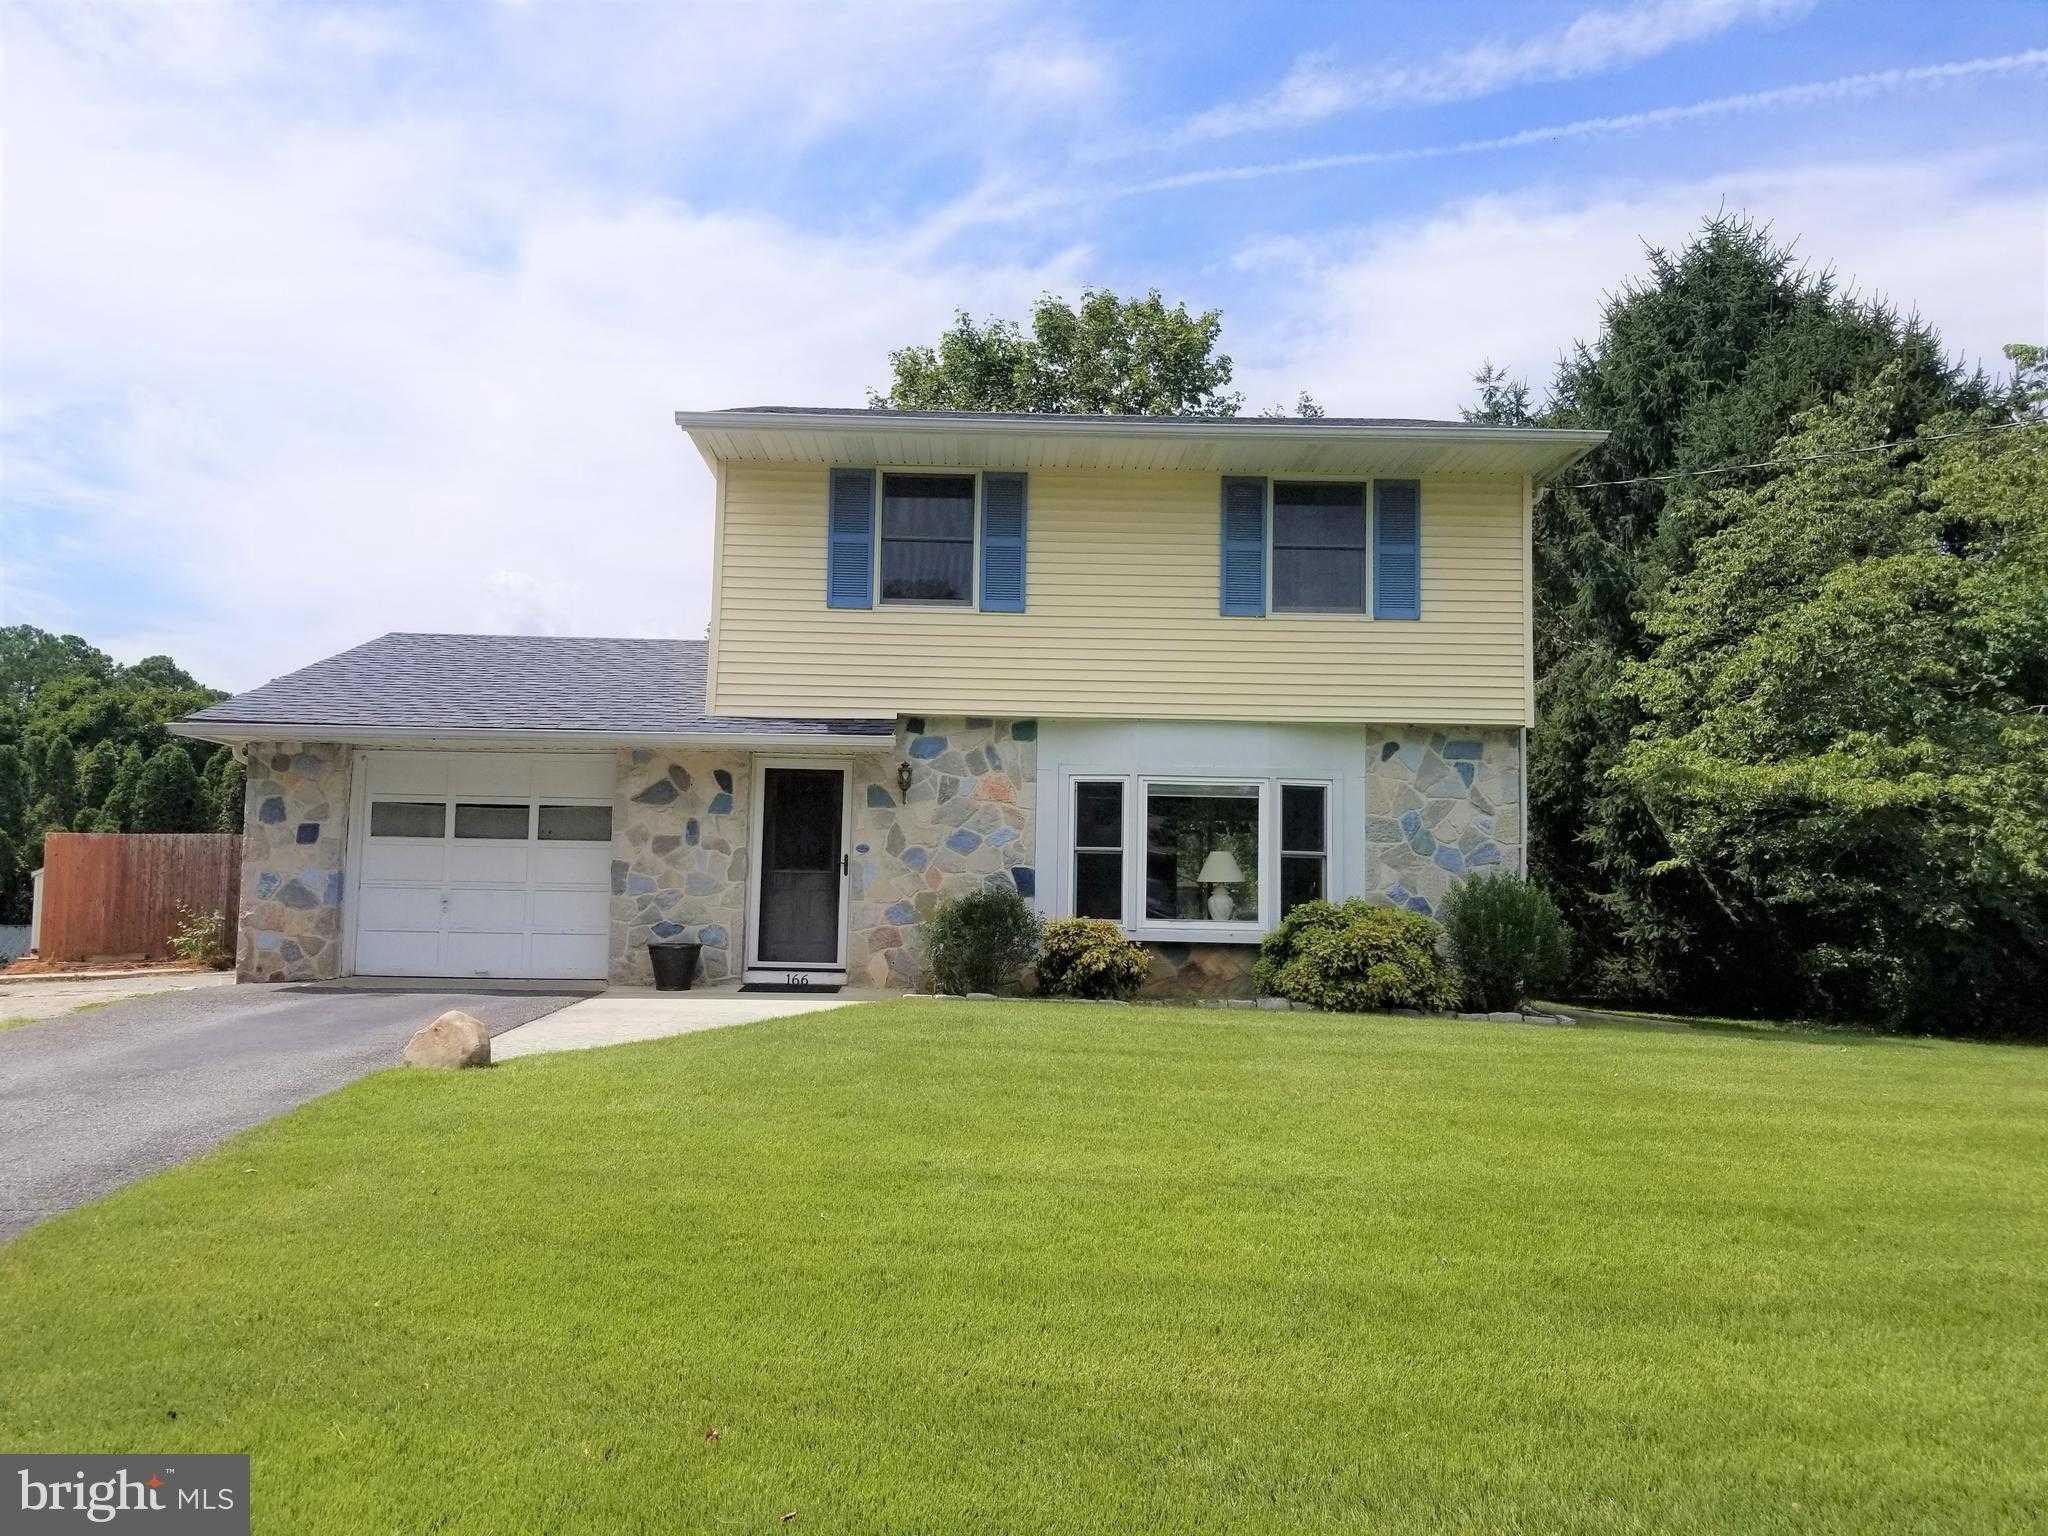 $180,000 - 3Br/2Ba -  for Sale in Sunnyside Acres, Smyrna